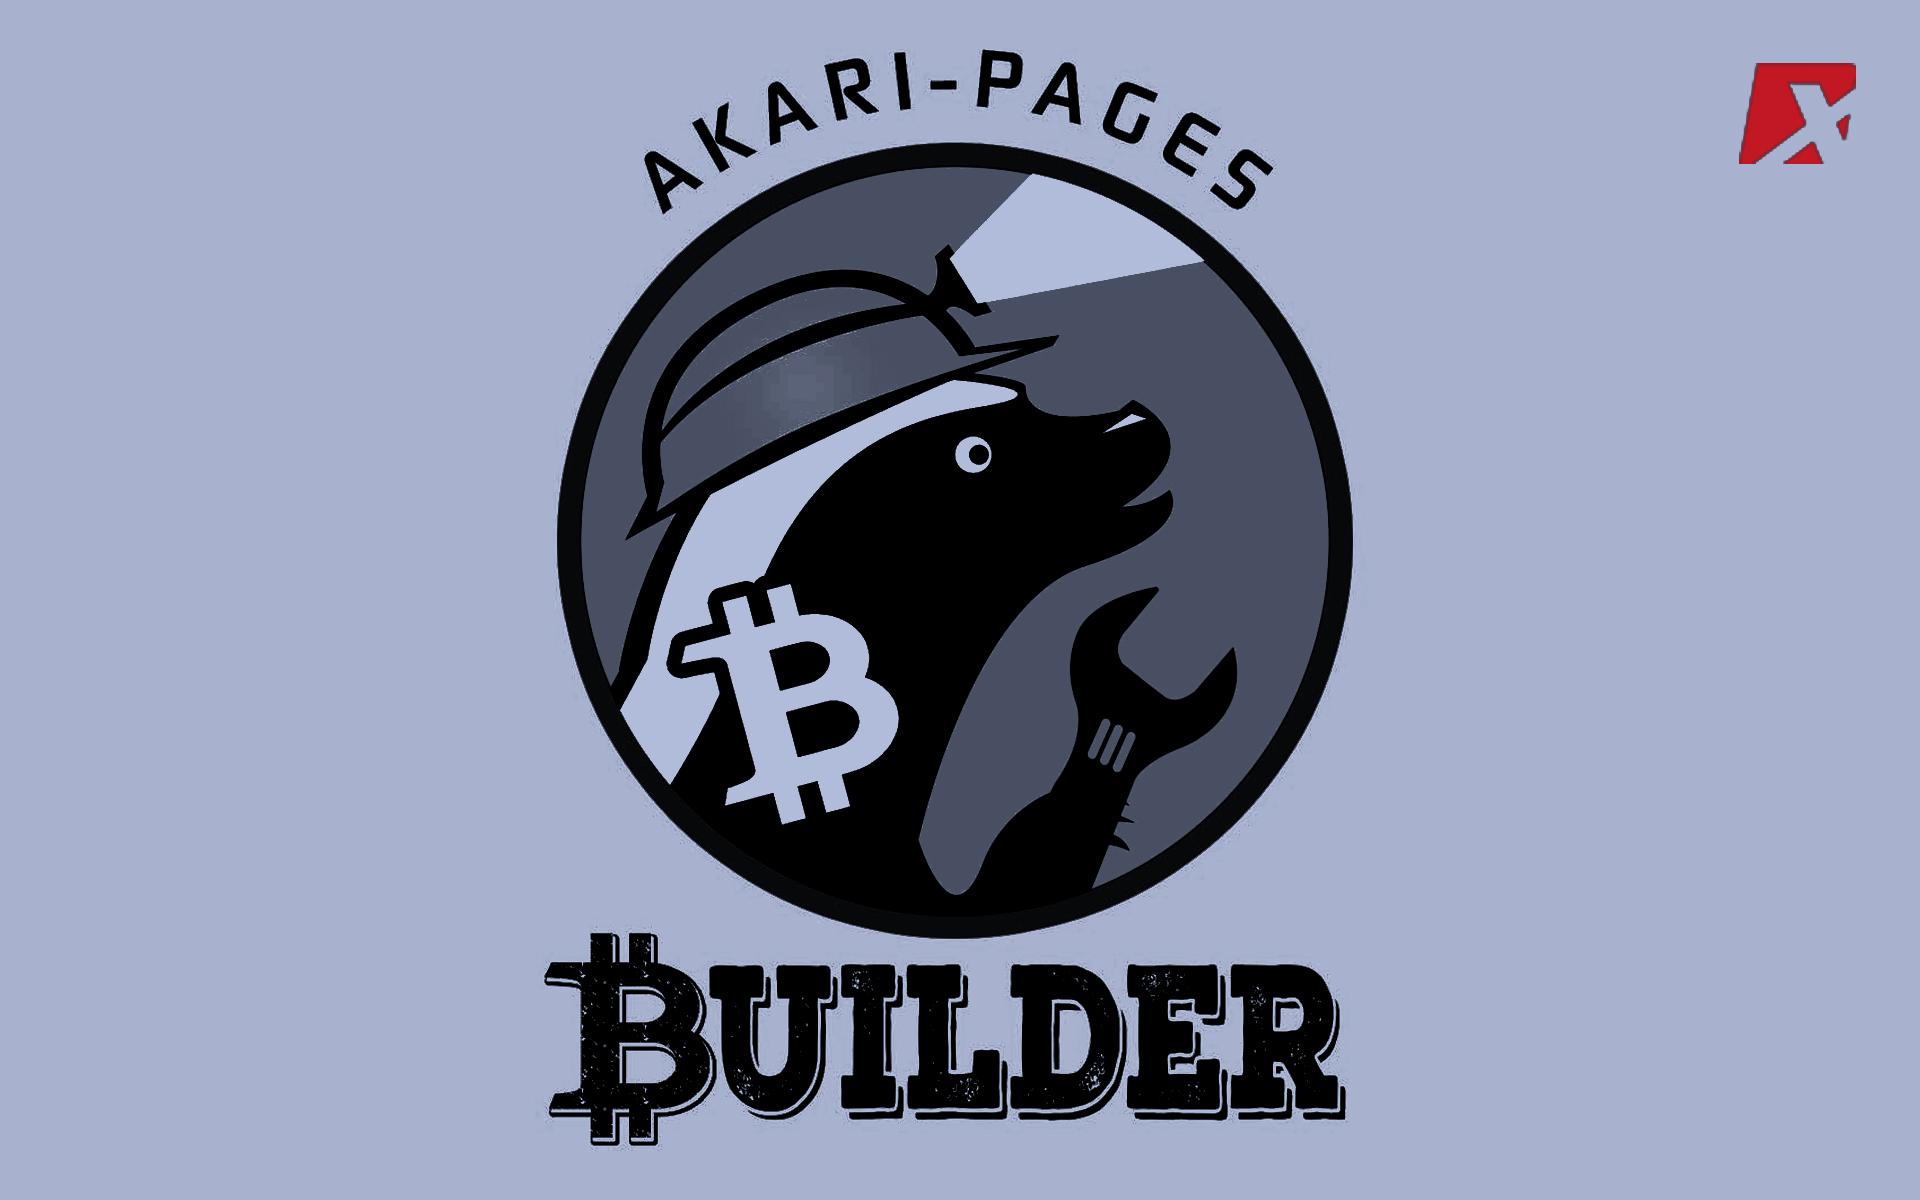 Behold Akari Now Offers BCH-Powered Micro-Site Builder! | Ibinex News